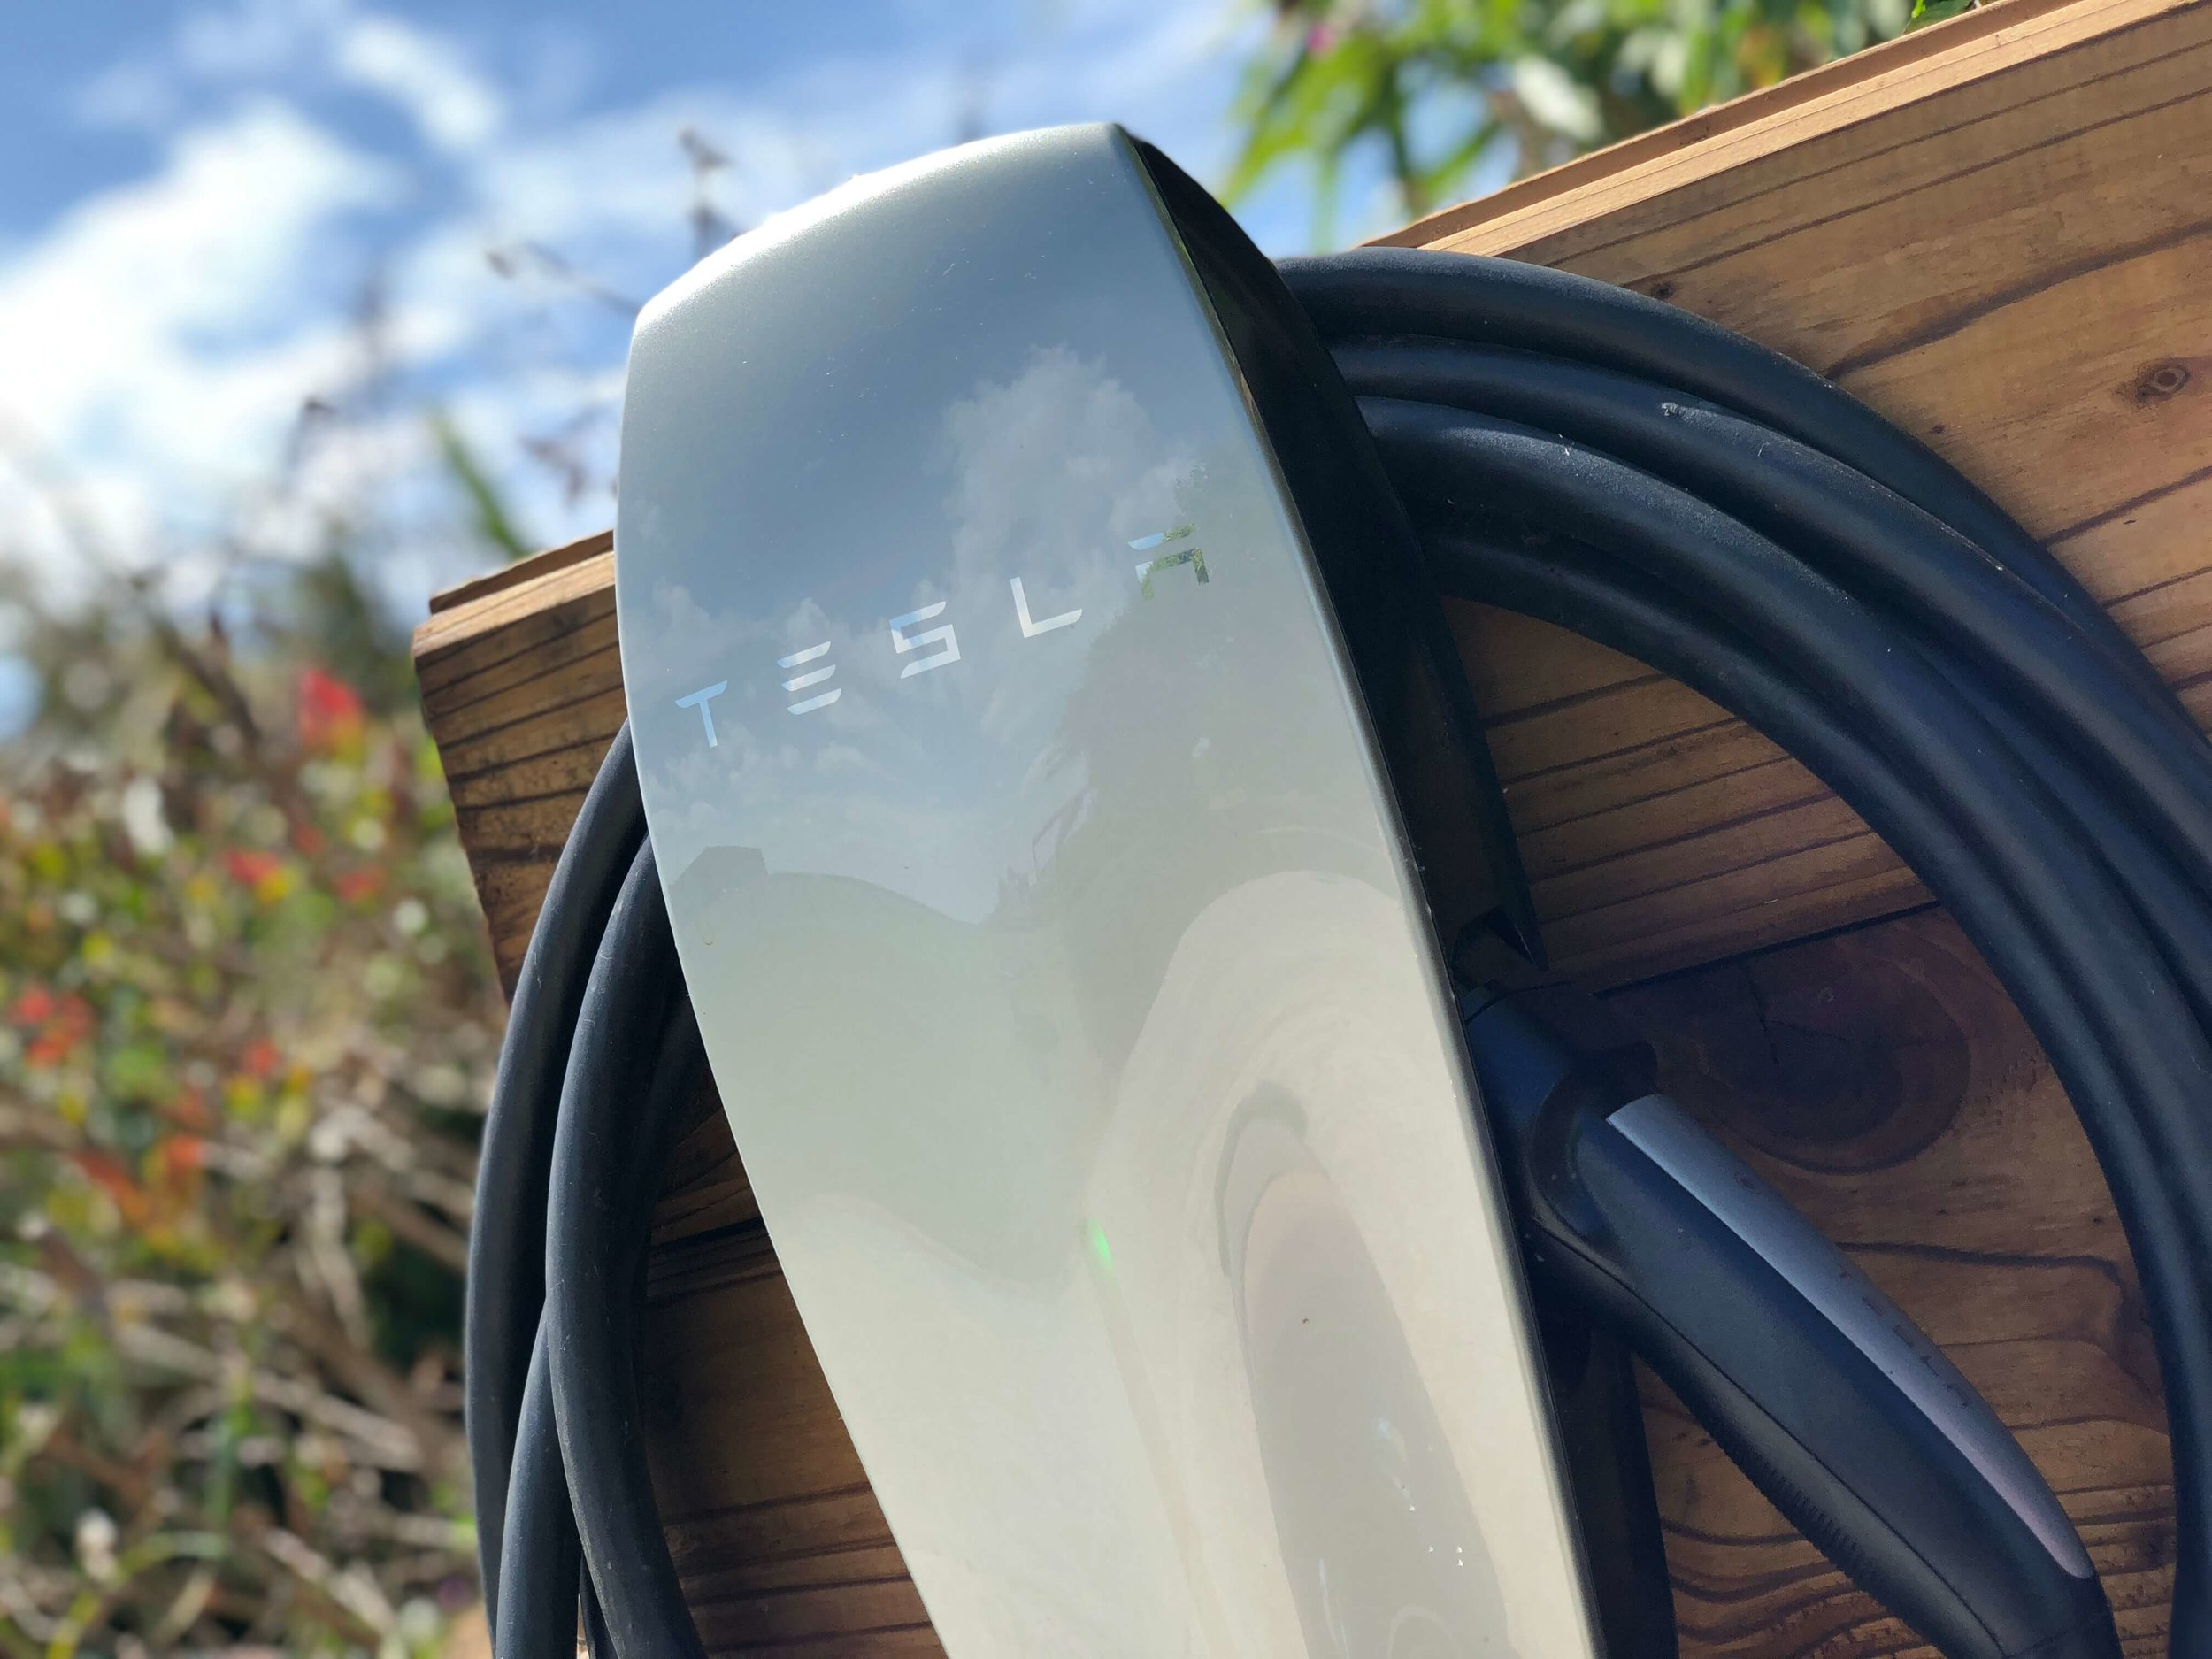 tesla-charging-point-1.jpg